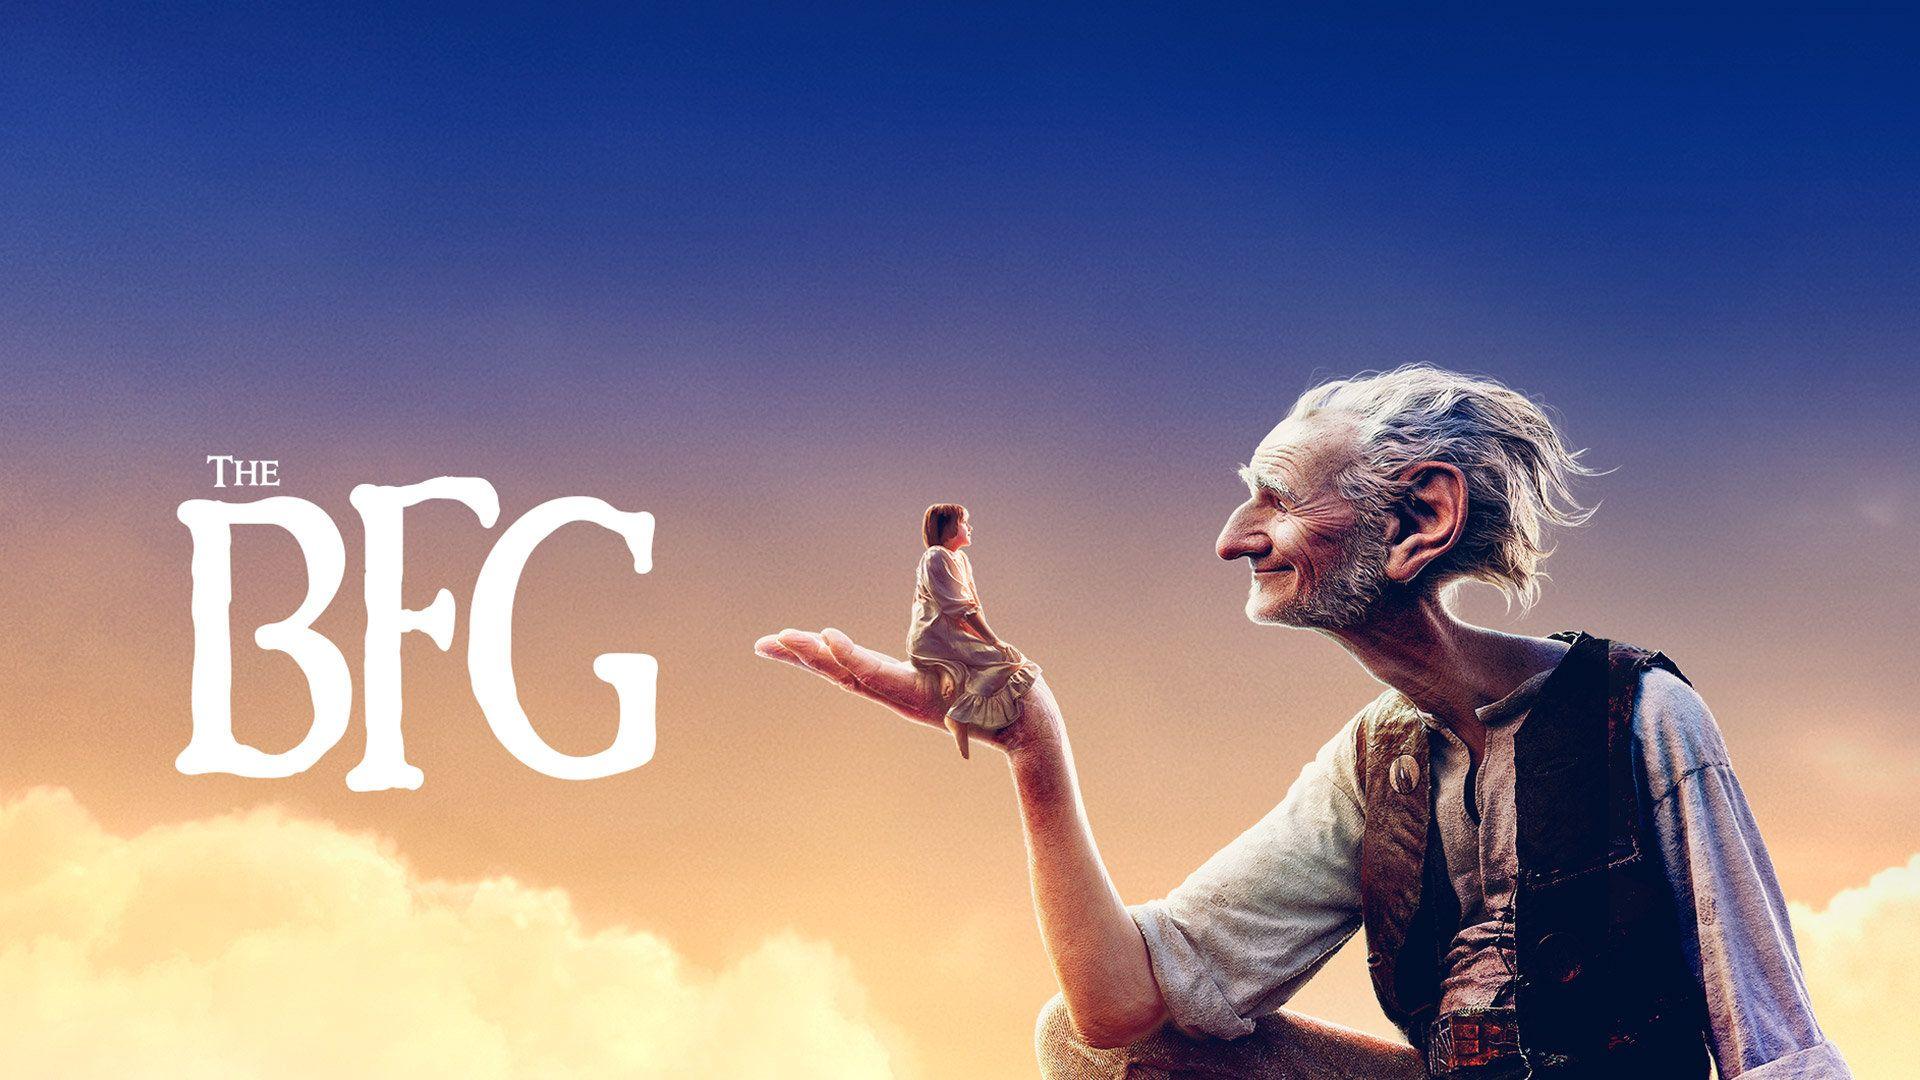 Pete S Dragon Movie Wallpaper | BFG -- Big, Friendly Giant Movie ...